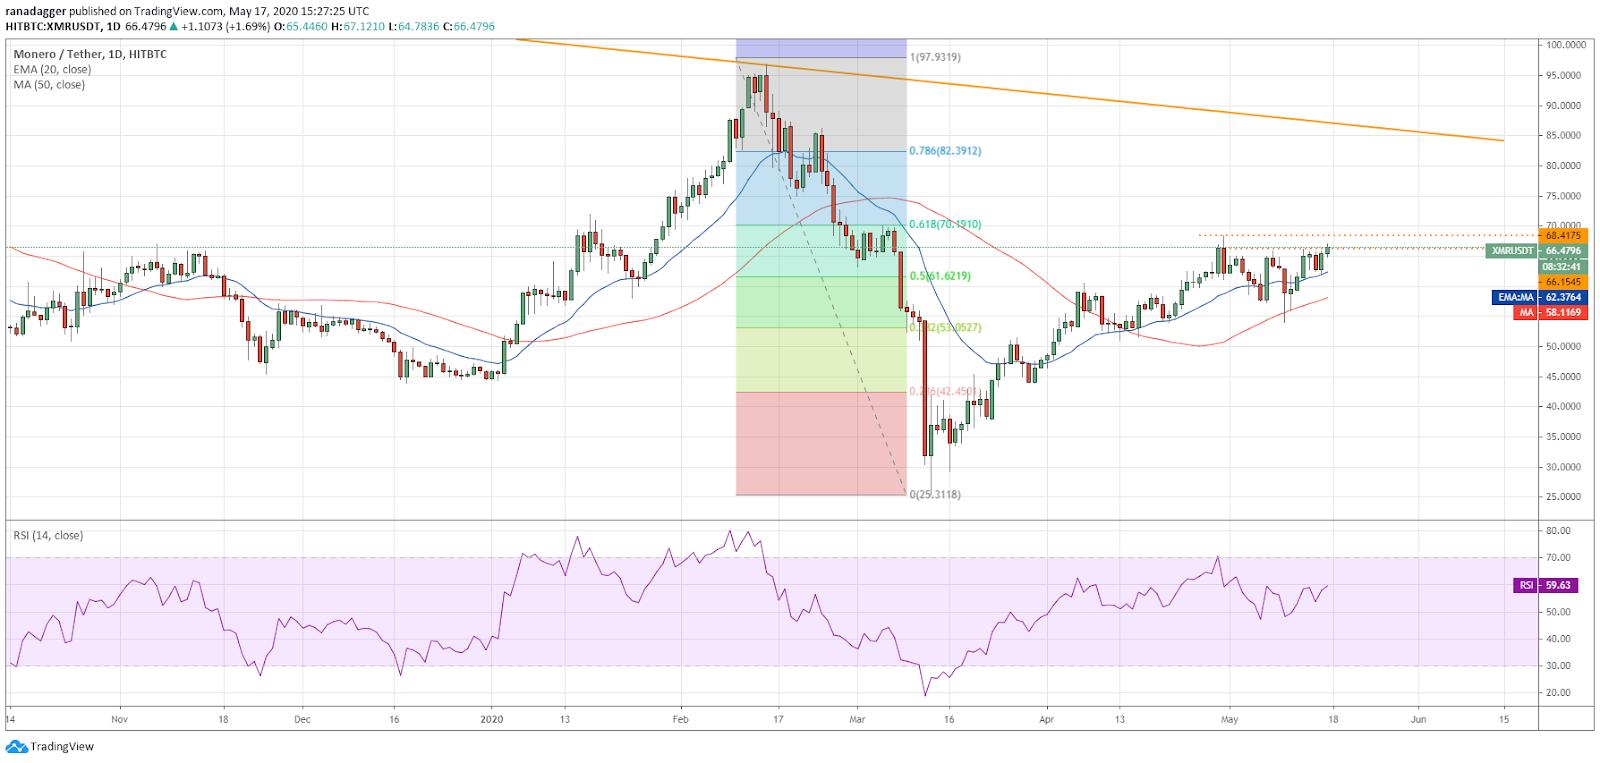 XMR-USD daily chart. Source: Tradingview